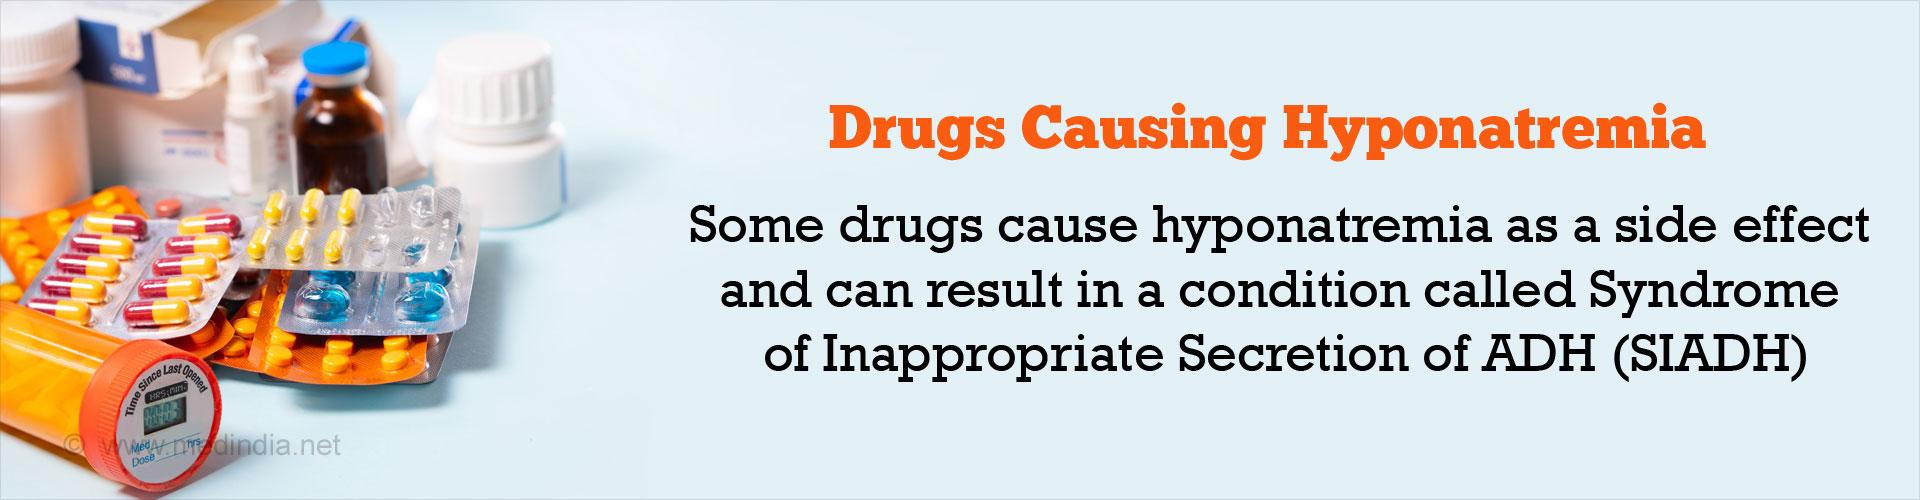 Drugs Causing Low Sodium Levels / Hyponatremia